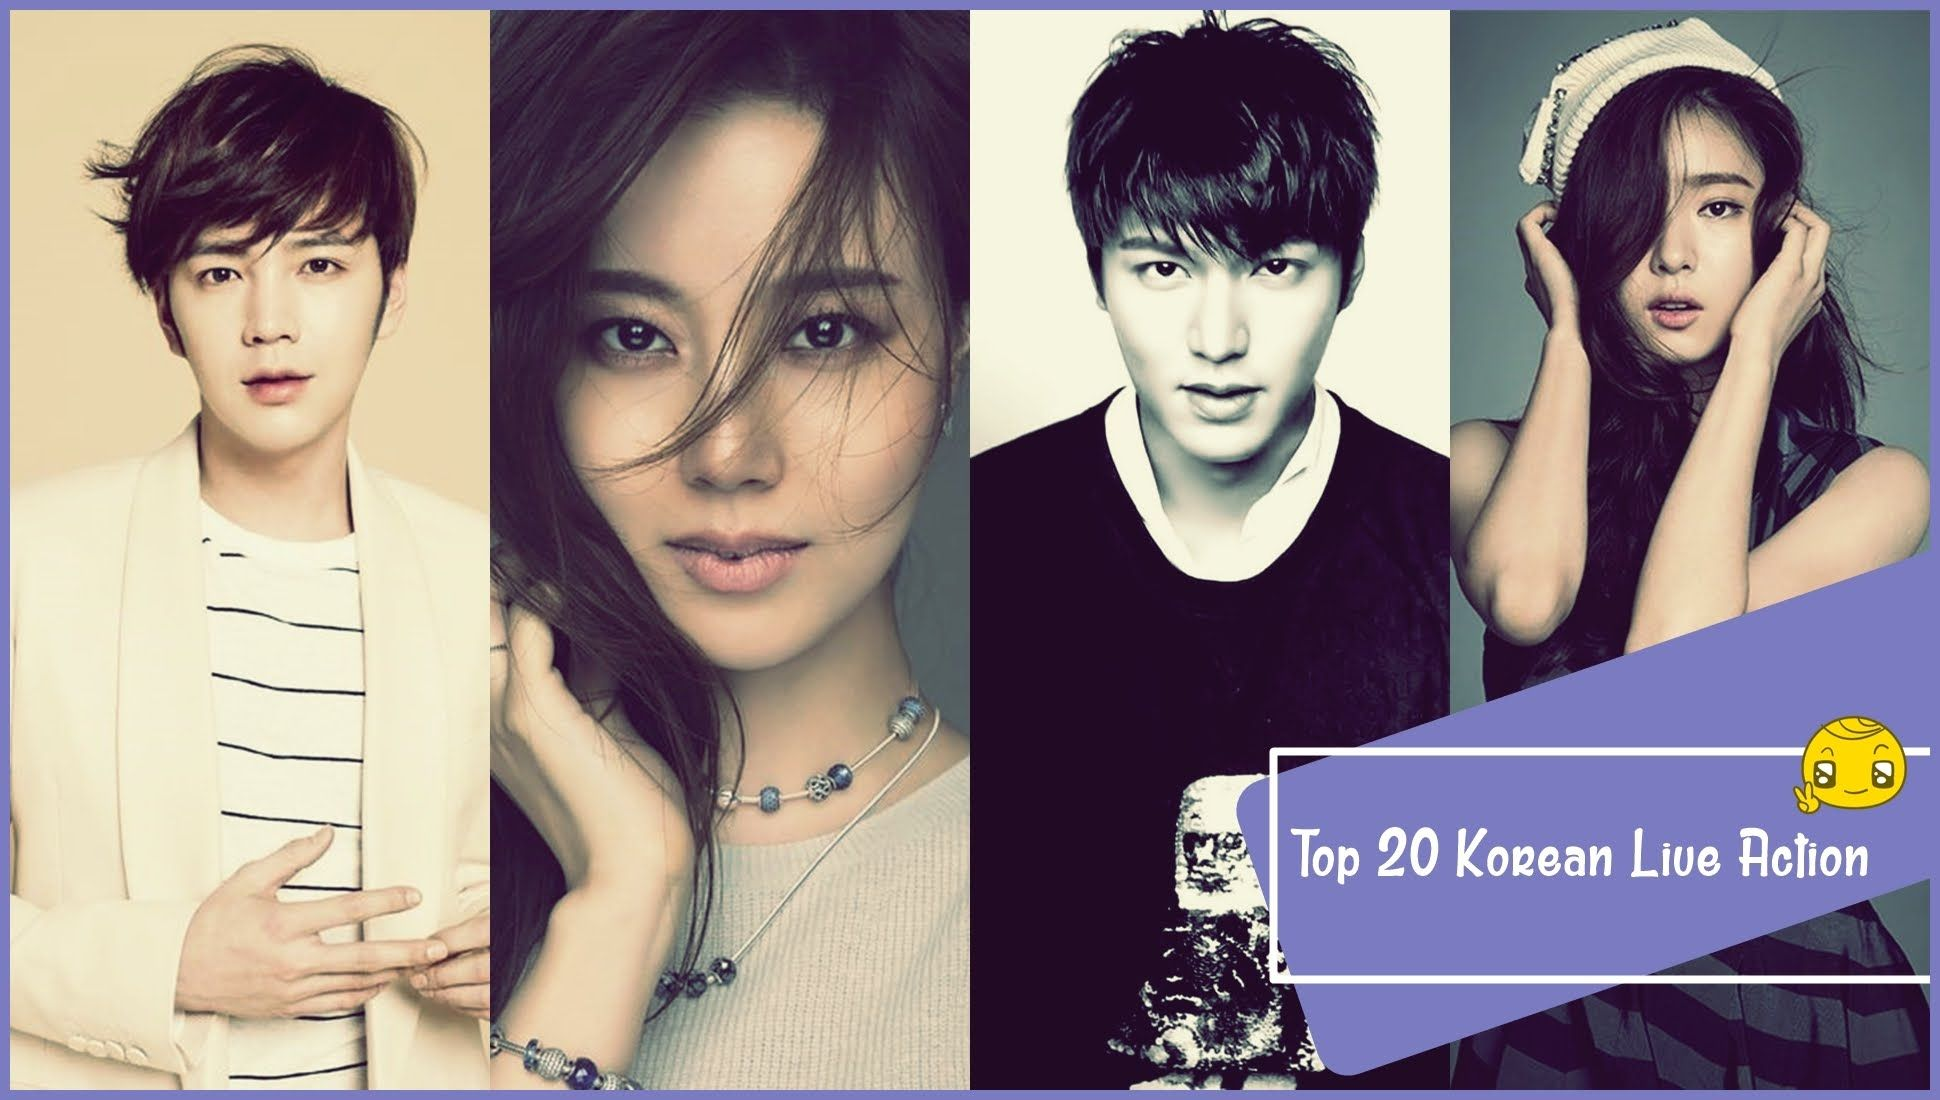 Top 20 Korean Live Action Movies/Dramas